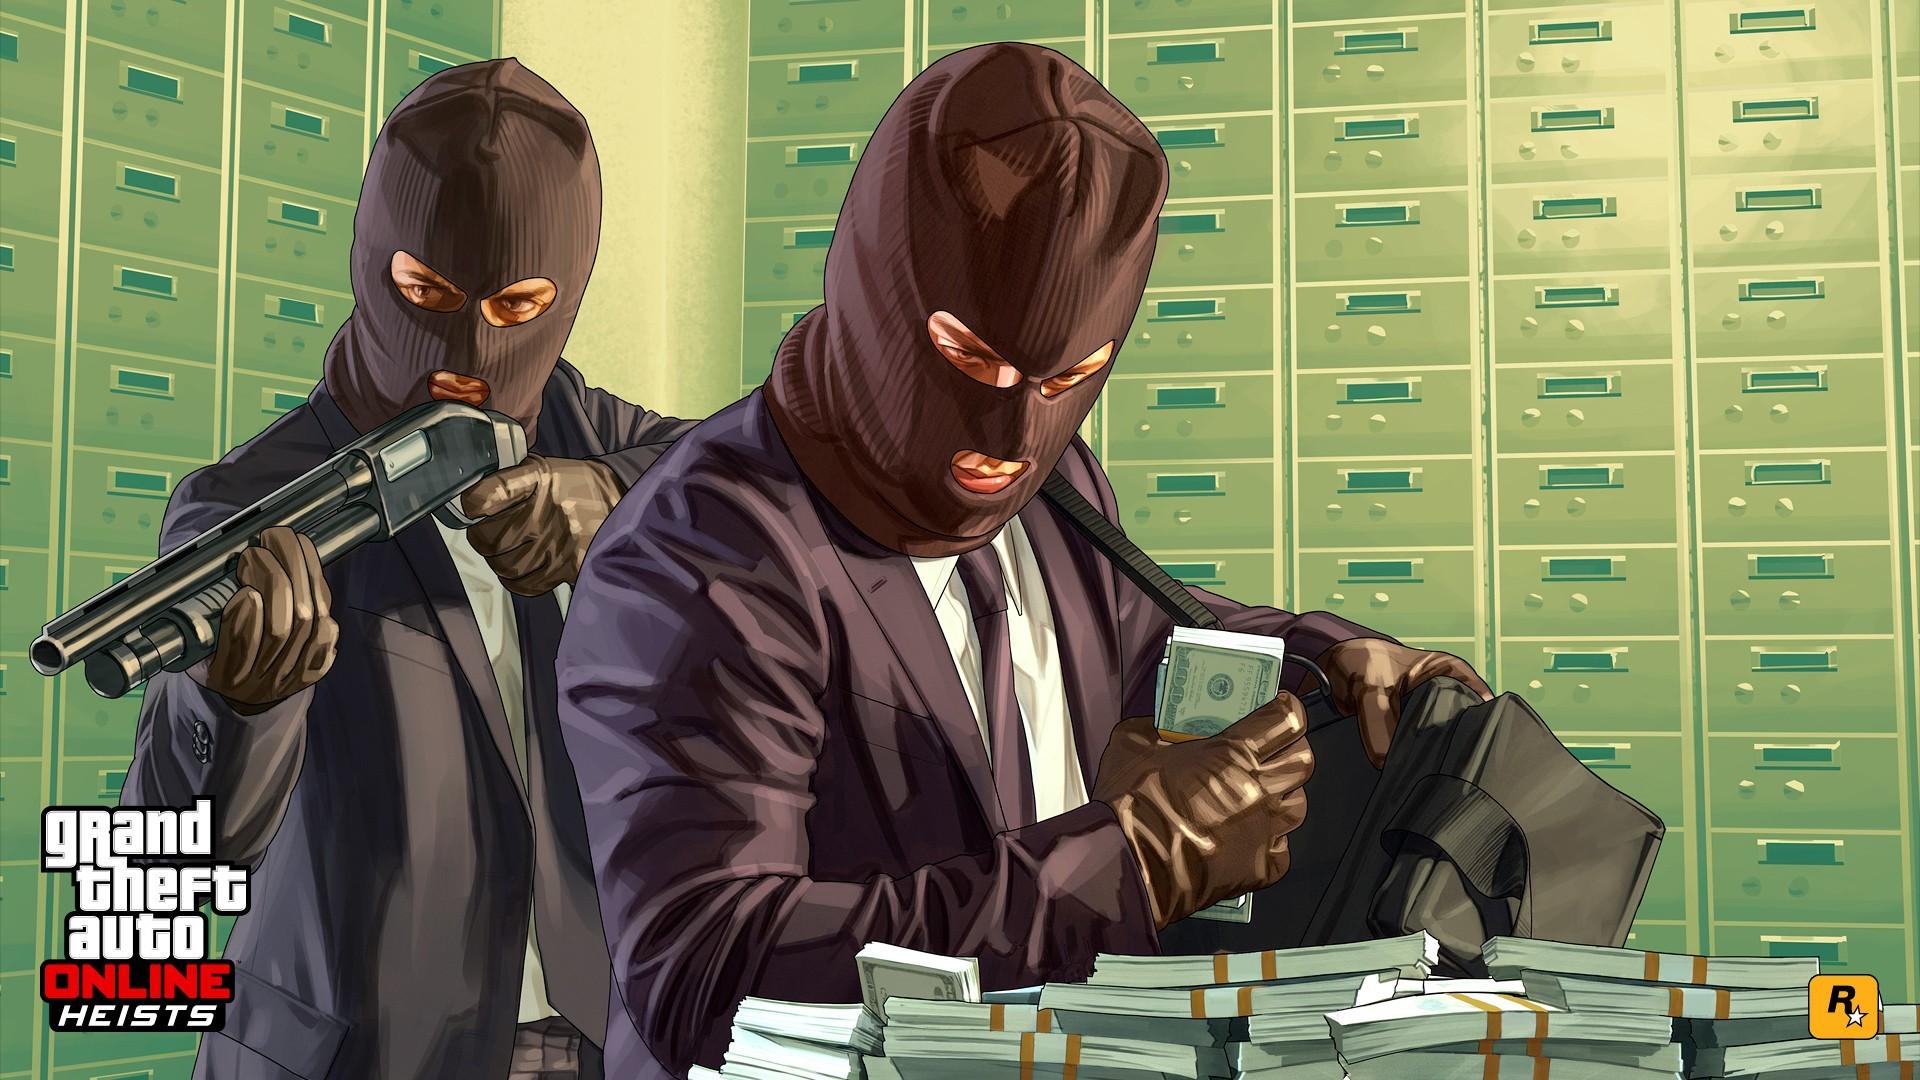 Wallpaper grand theft auto v, grand theft auto online, rockstar  games, heists